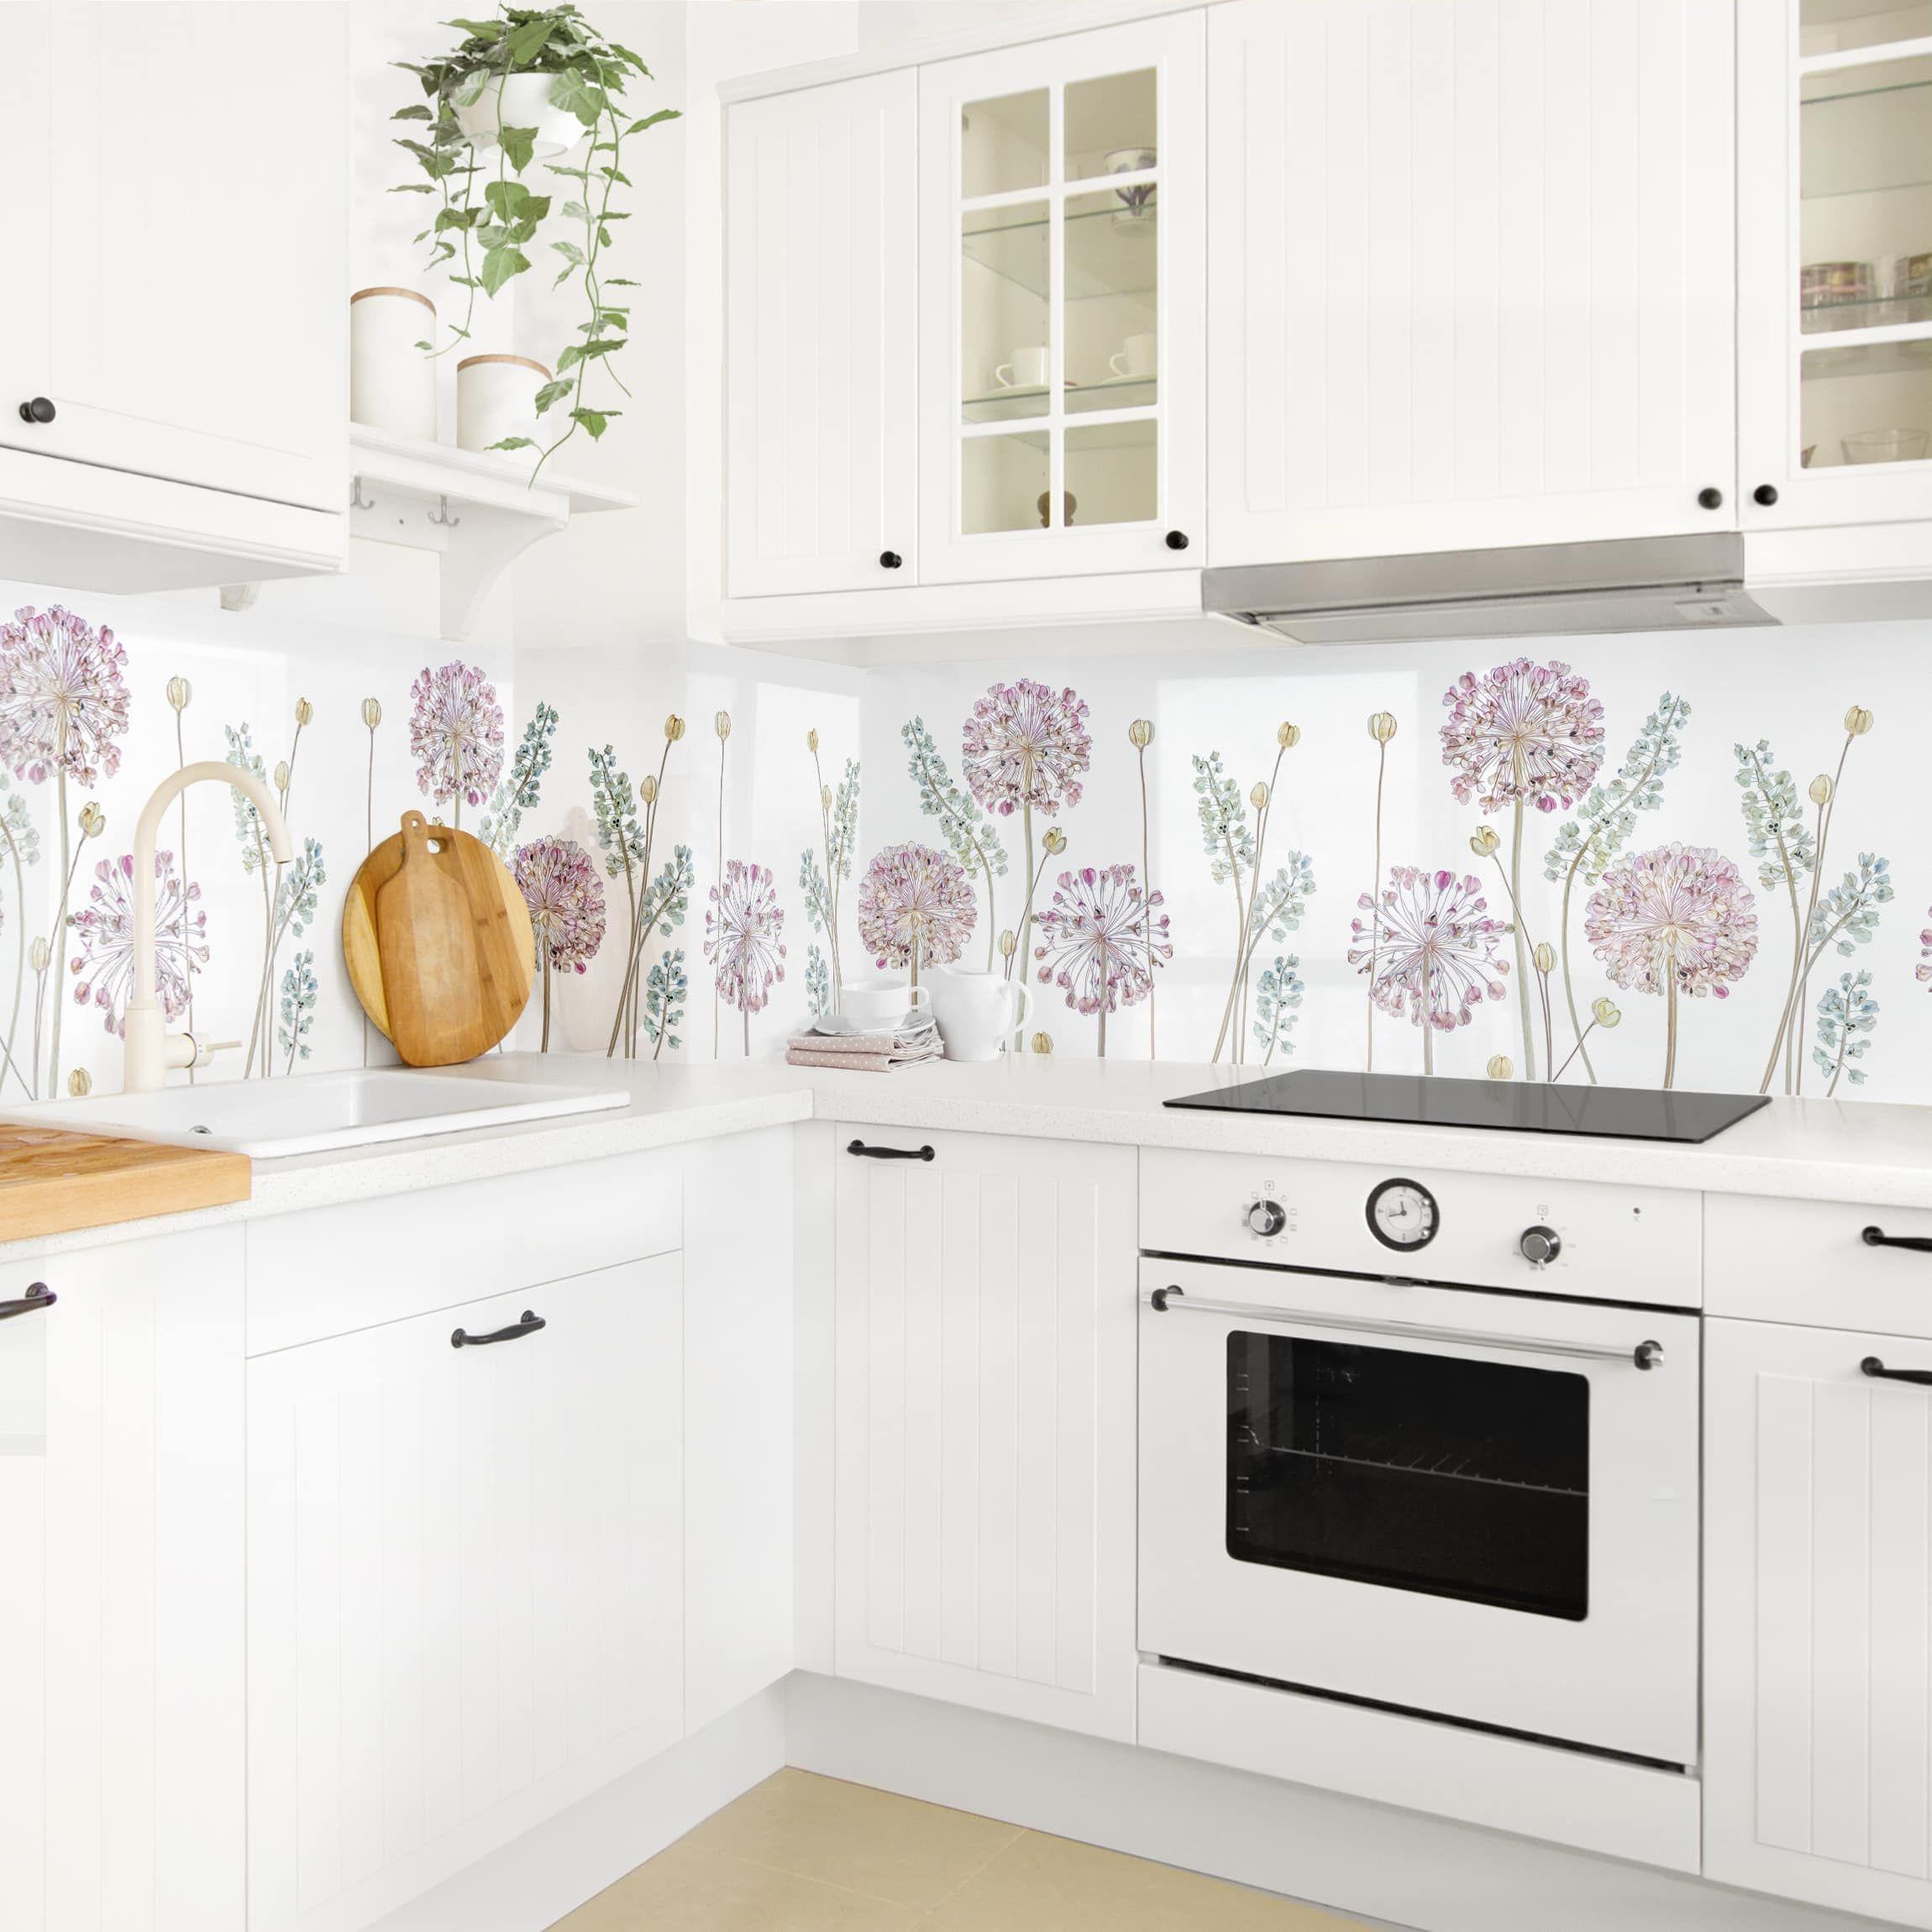 Kuchenruckwand Allium Illustration I Spritzschutz Kuchen